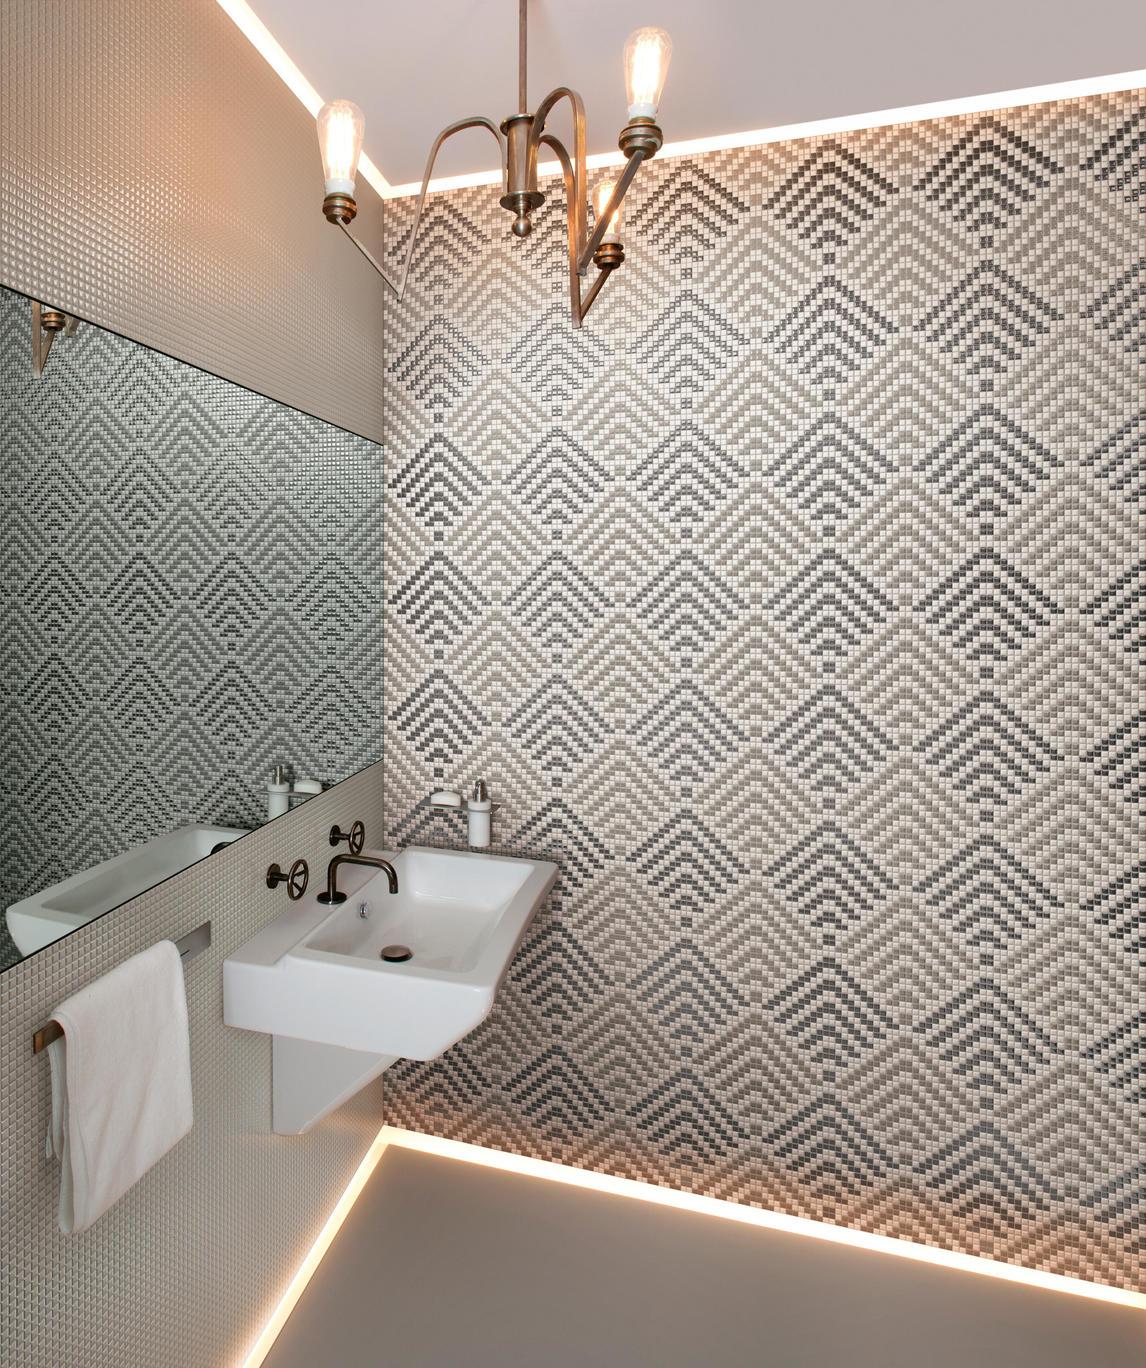 wayne tile company wayne nj 07470